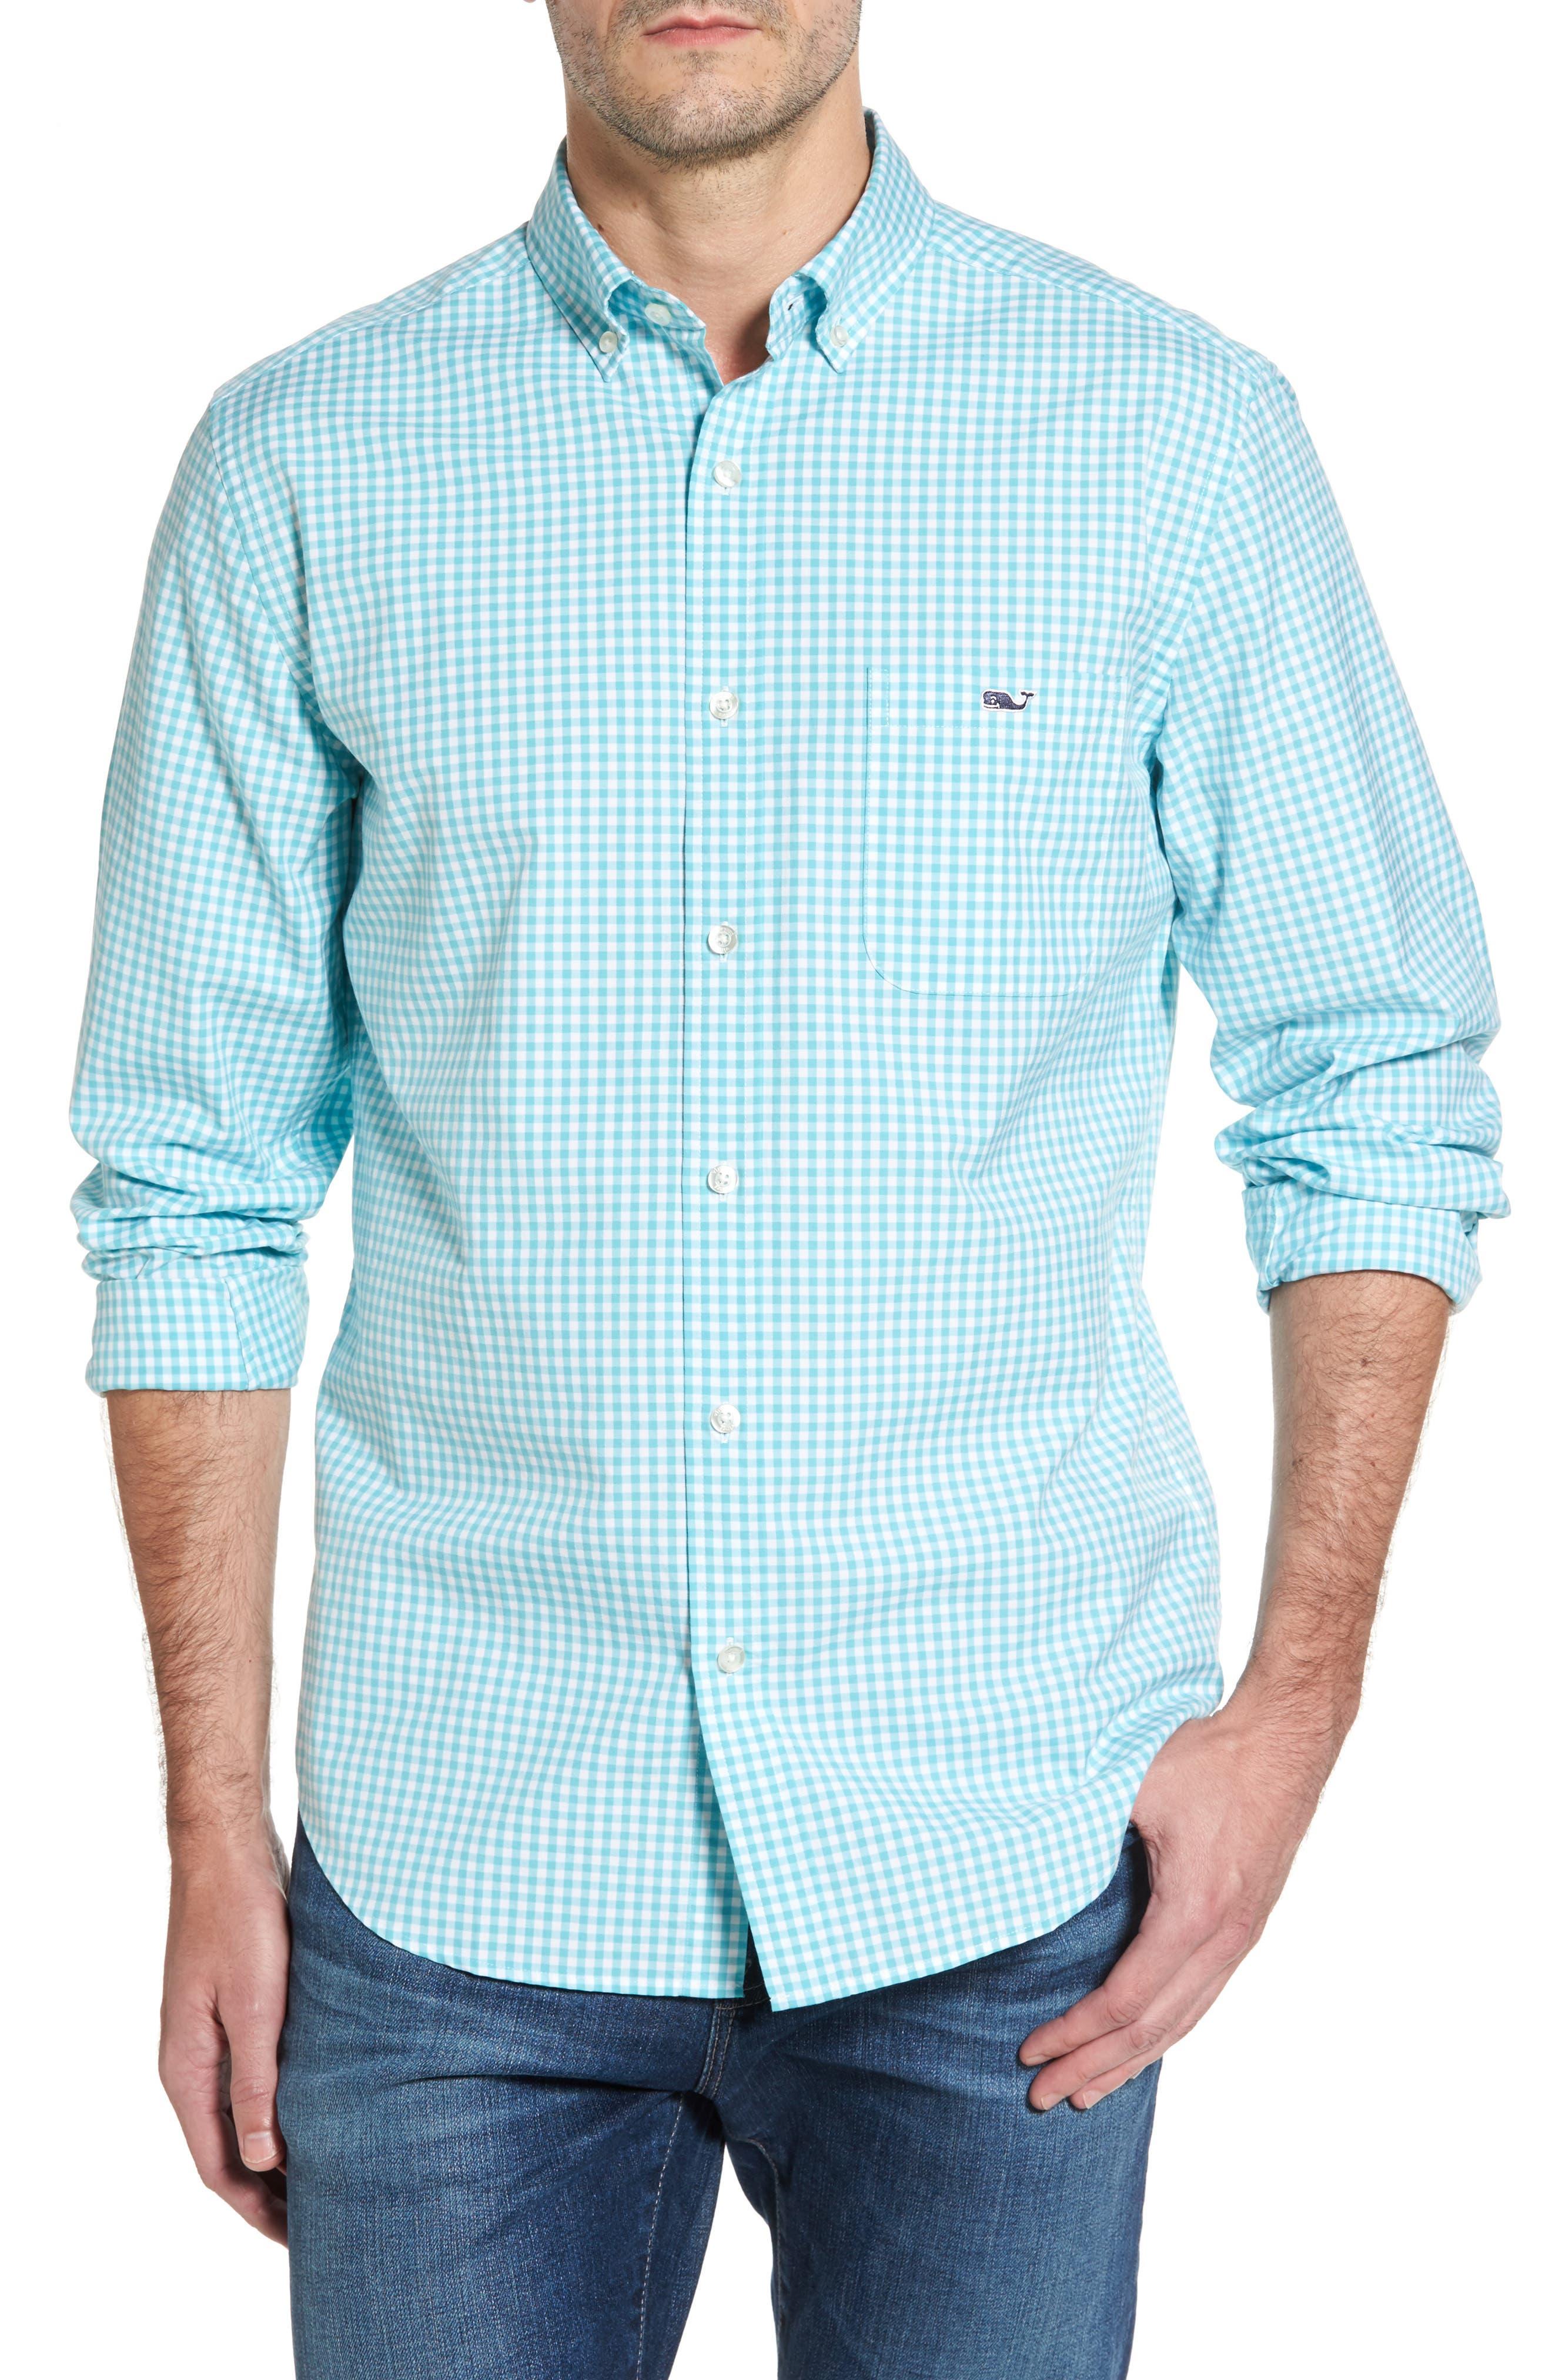 VINEYARD VINES,                             Seafloor Tucker Gingham Sport Shirt,                             Main thumbnail 1, color,                             302